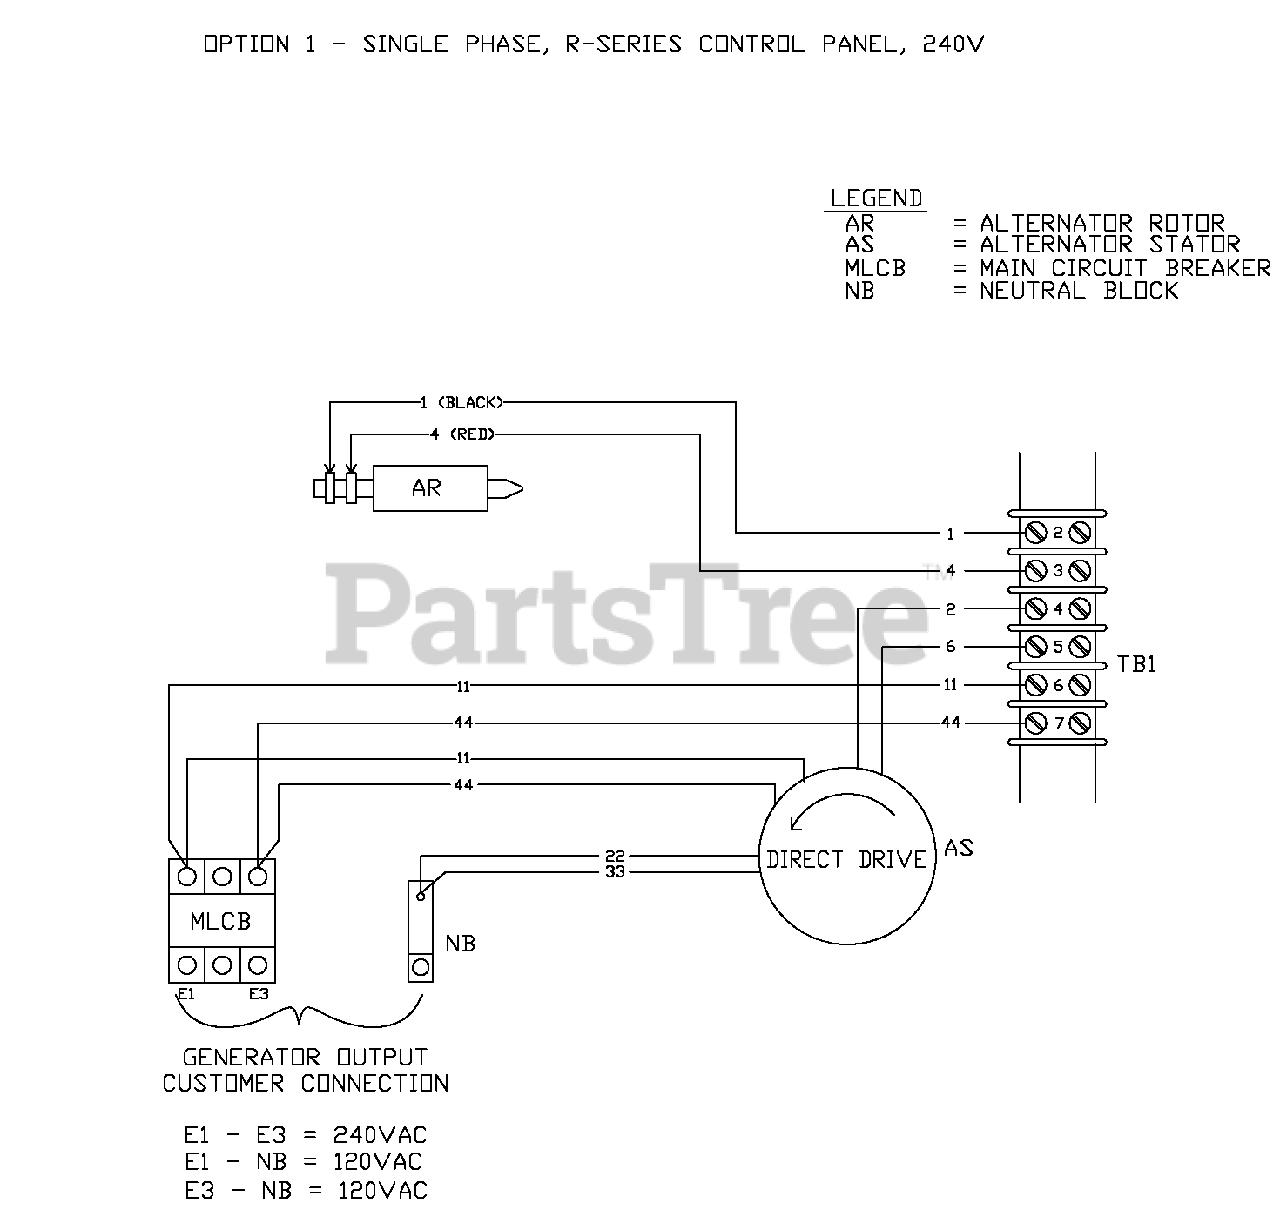 Generac Standby Generator Wiring Diagram from www.partstree.com